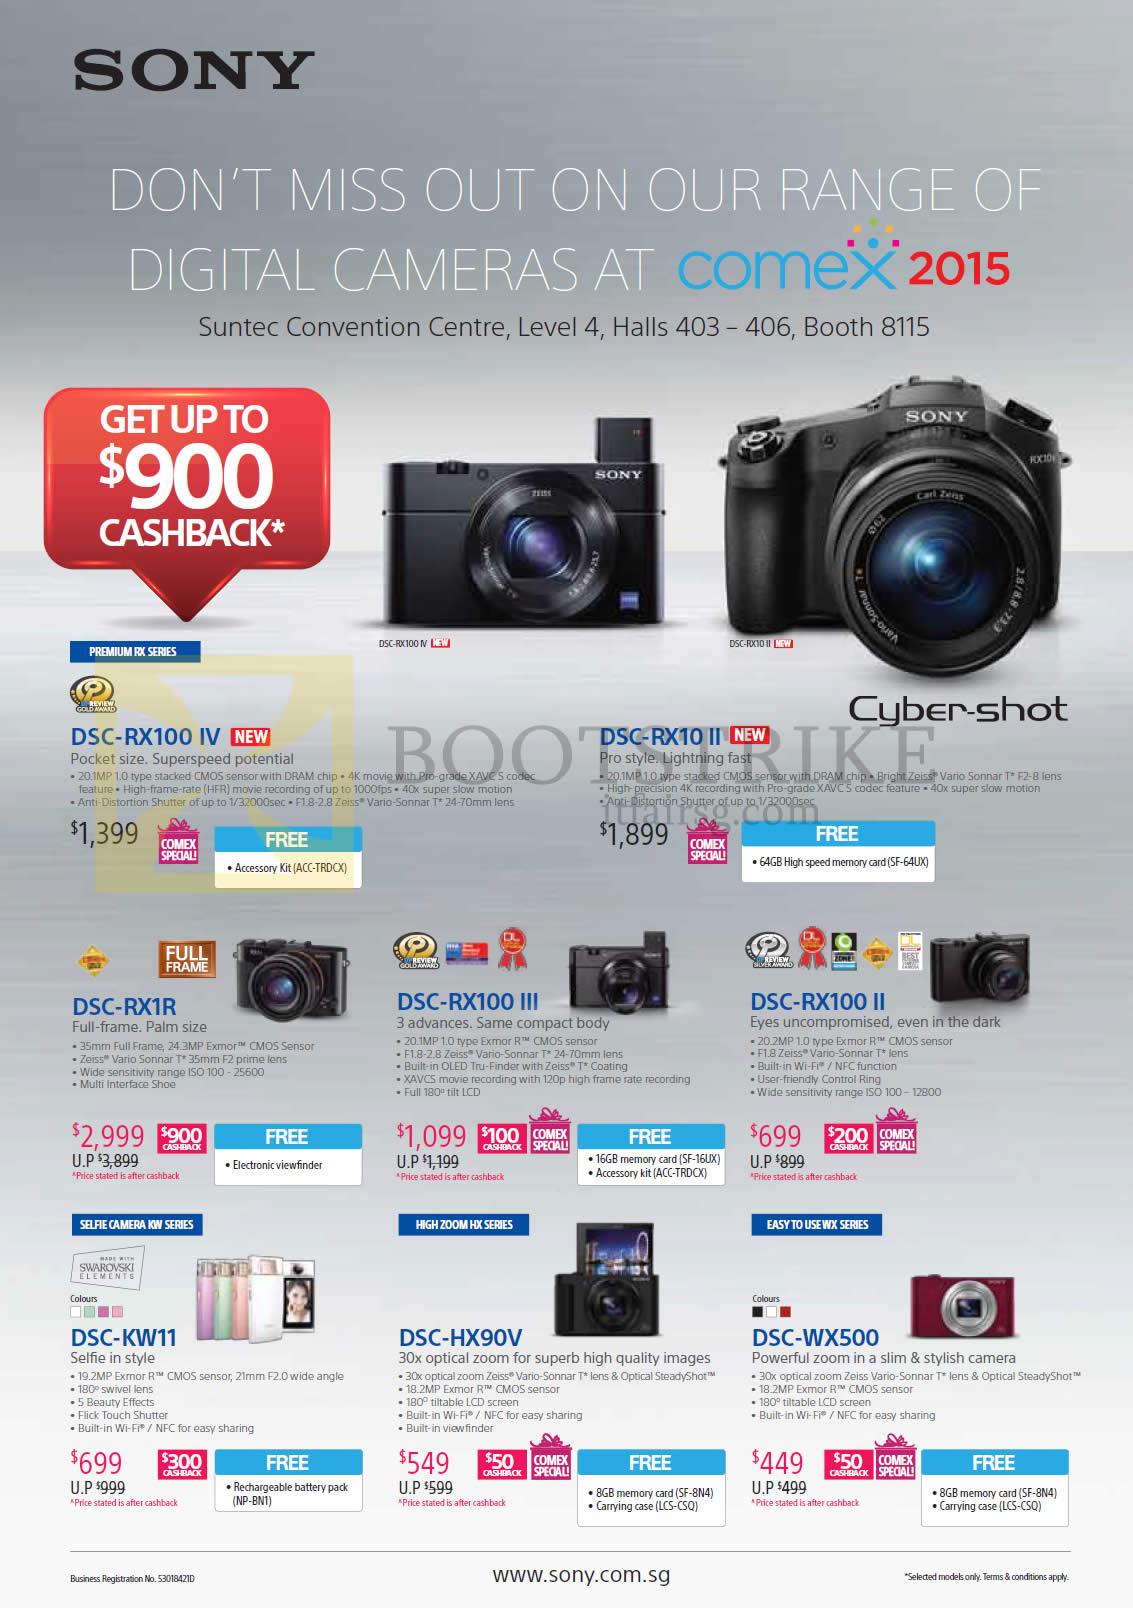 Sony Digital Cameras Cybershot DSC-RX100 IV, RX10 II, RX1R, RX100 III, RX100 II, KW11, HX90V, WX500